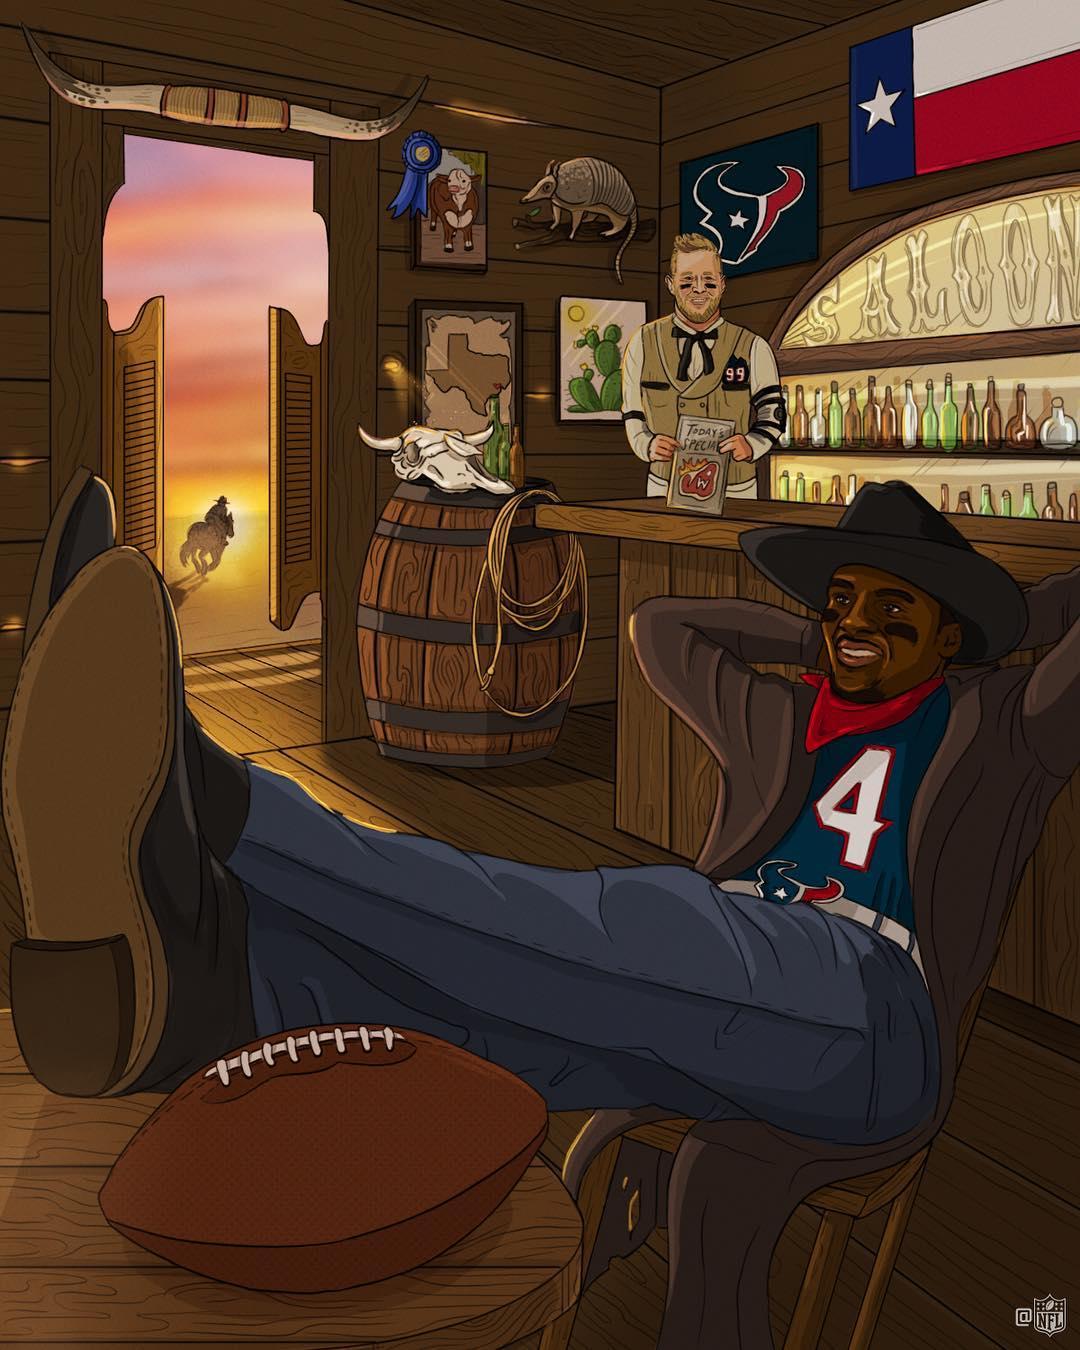 Deshaun Watson of the Houston Texans.